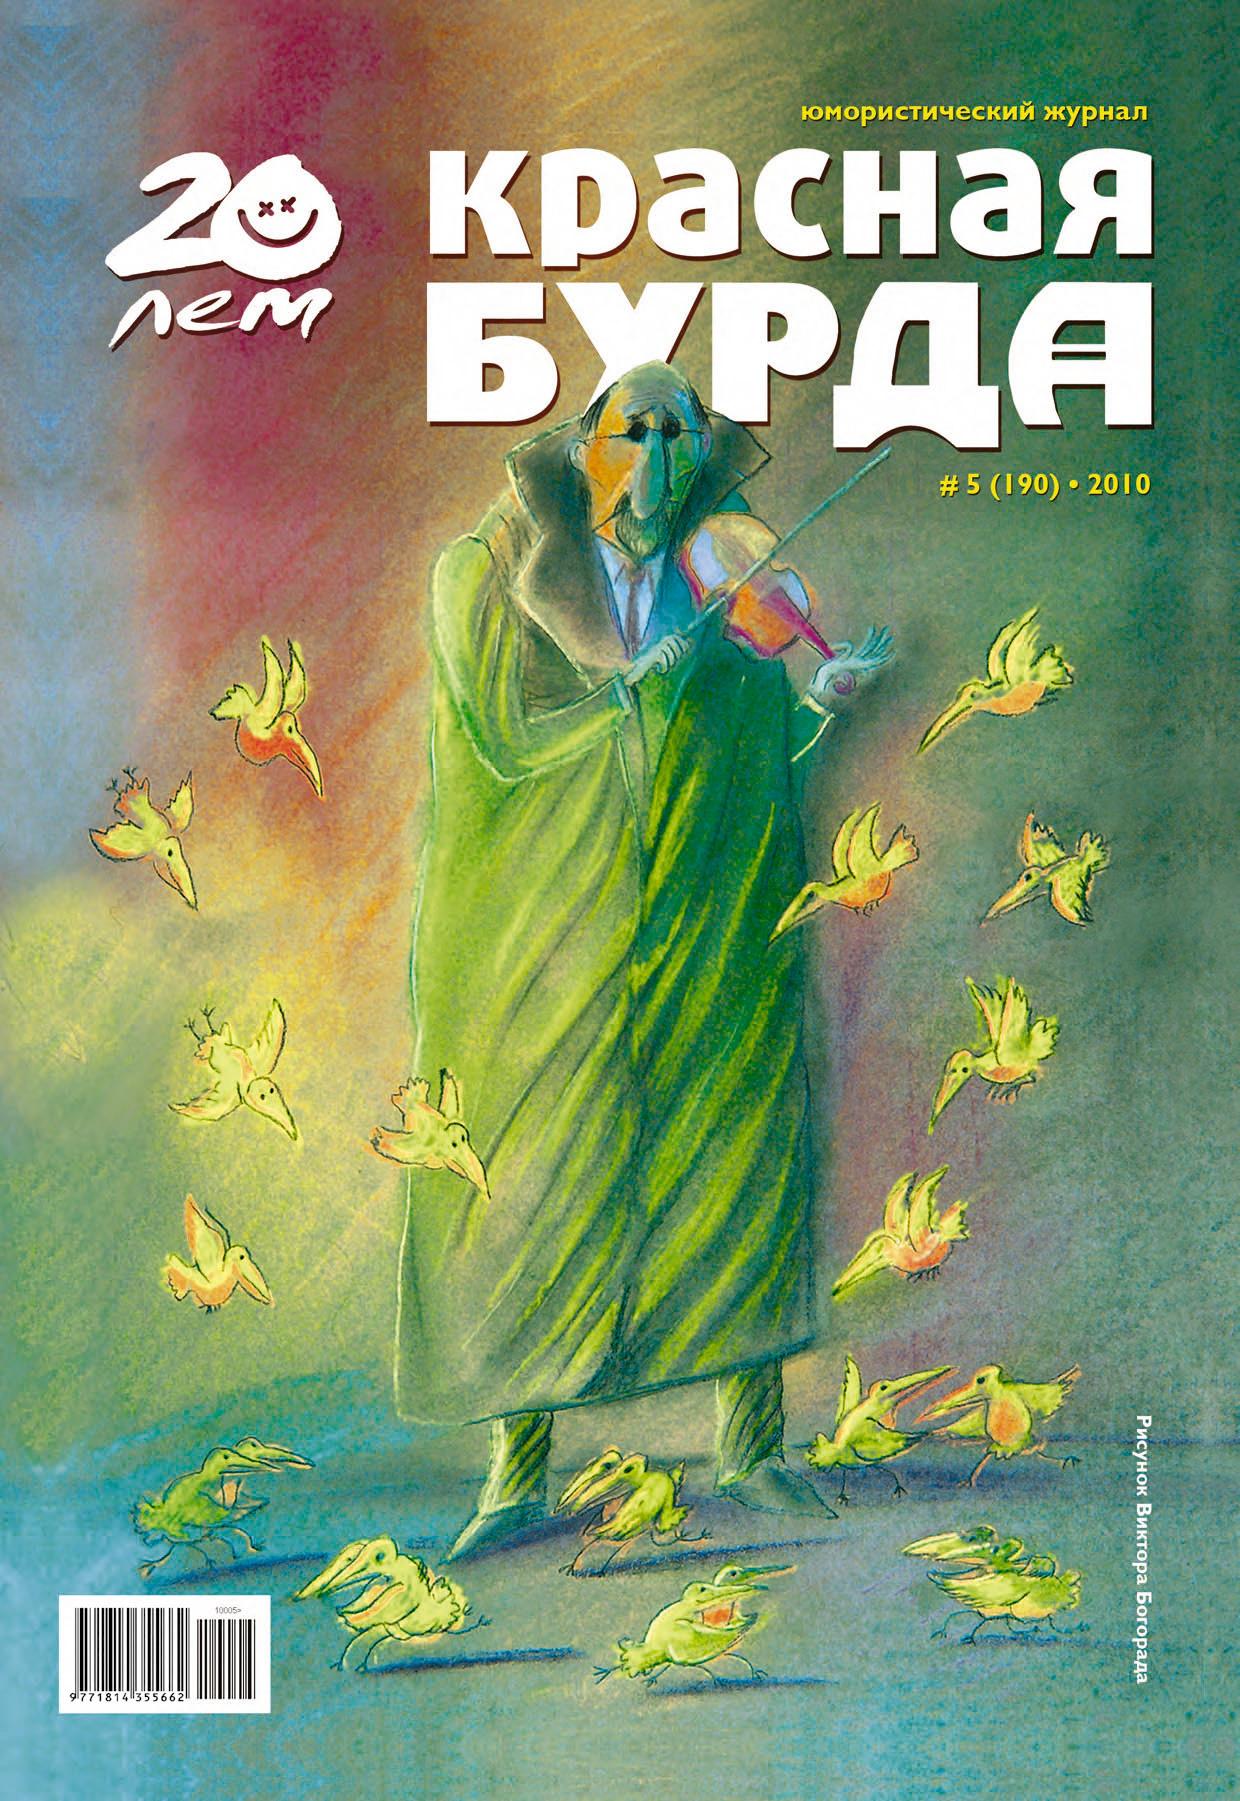 Красная бурда. Юмористический журнал №5 (190) 2010